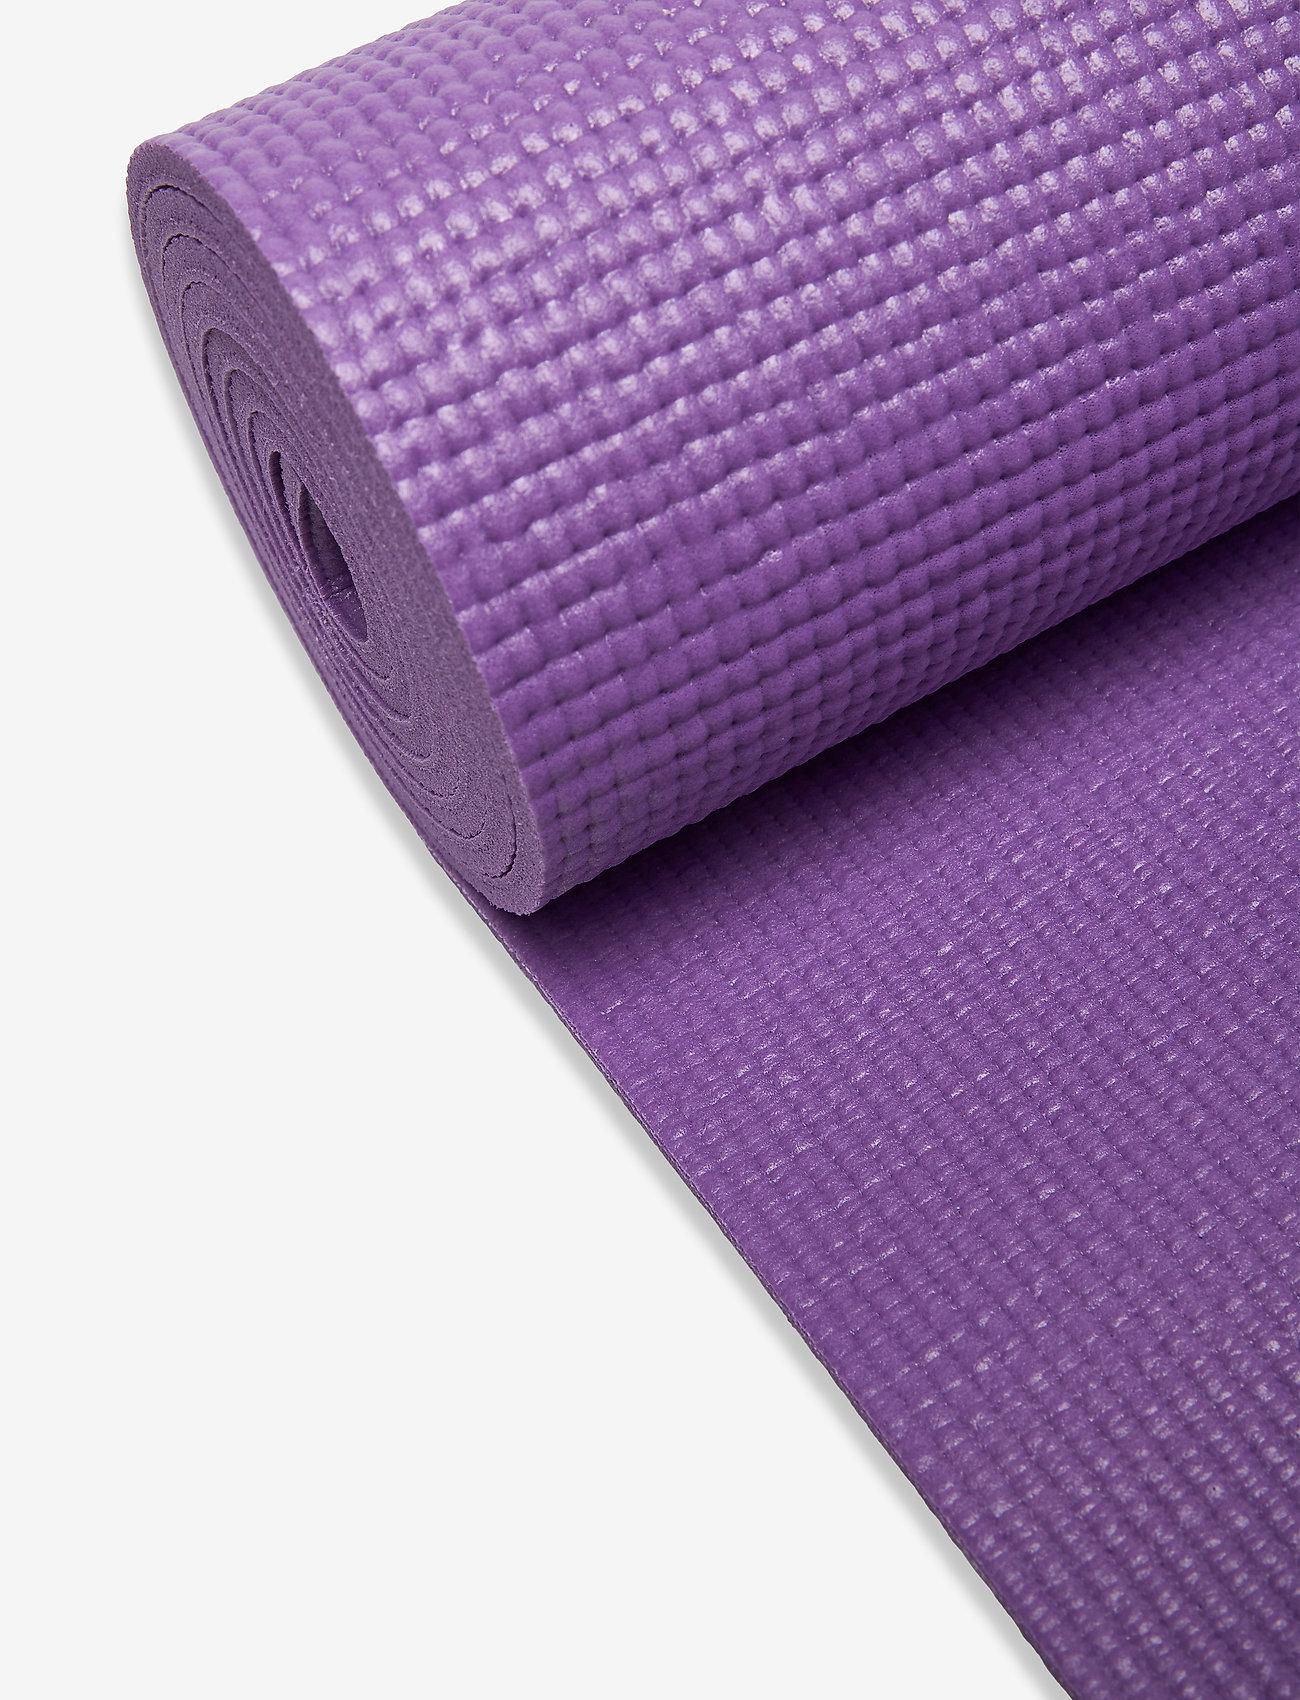 Yogiraj - All-round yoga mat 6 mm - Yogiraj - yogamatten & ausrüstung - lilac purple - 1